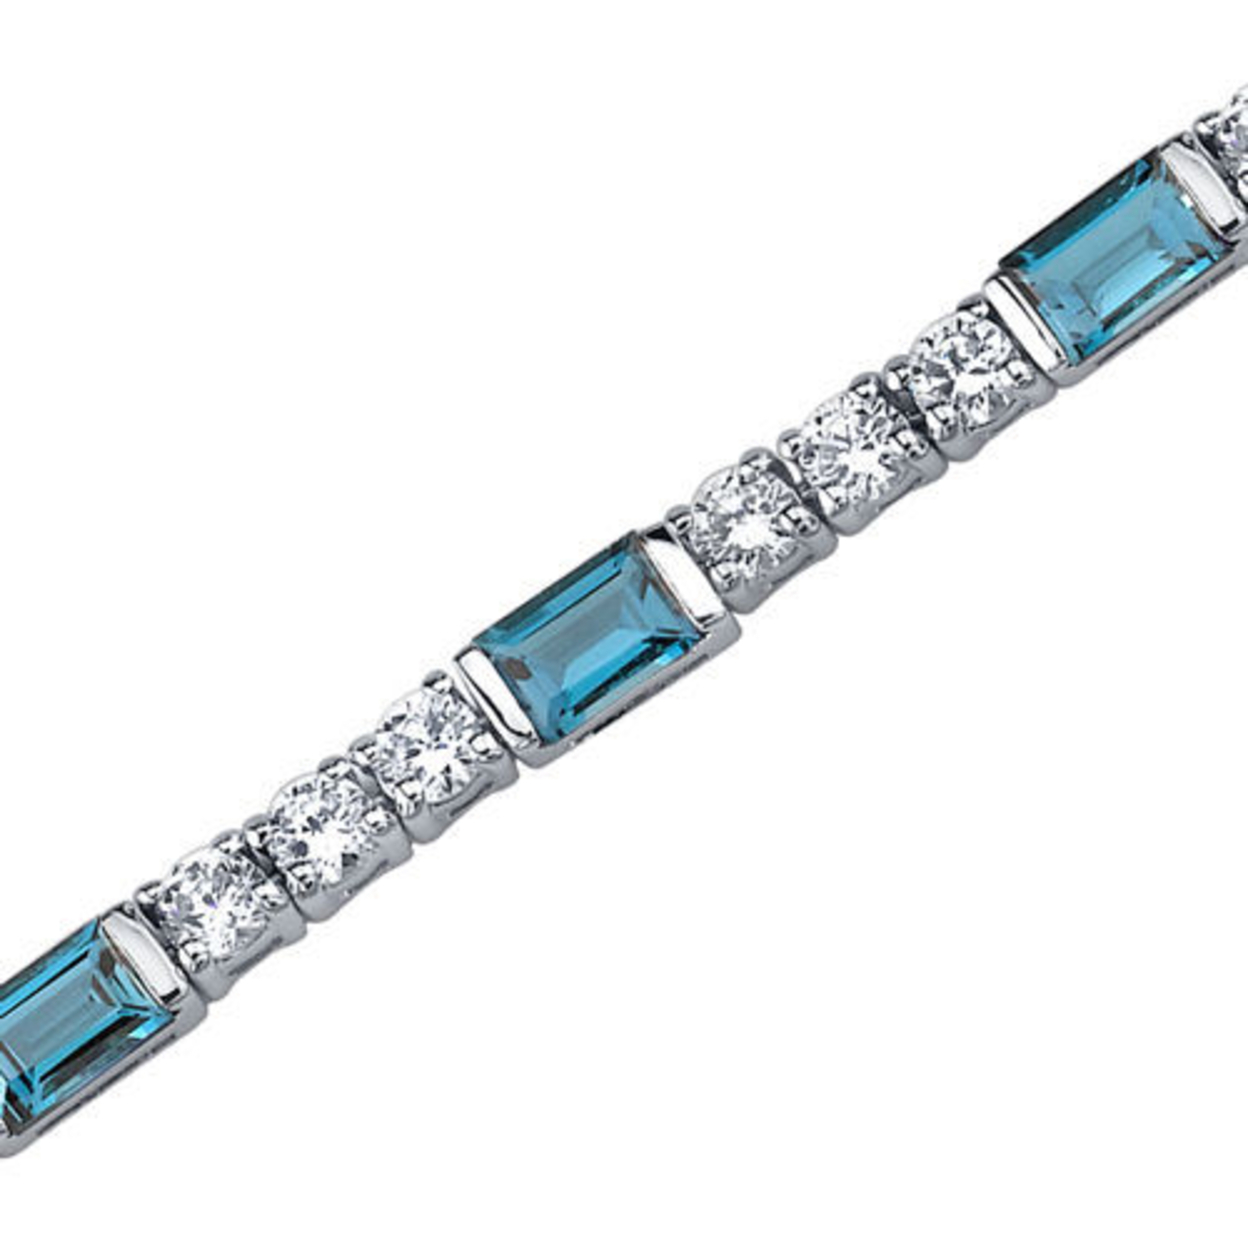 5.75 Carats Baguette Cut London Blue Topaz & White Cz Bracelet In Sterling Silver Style Sb3760